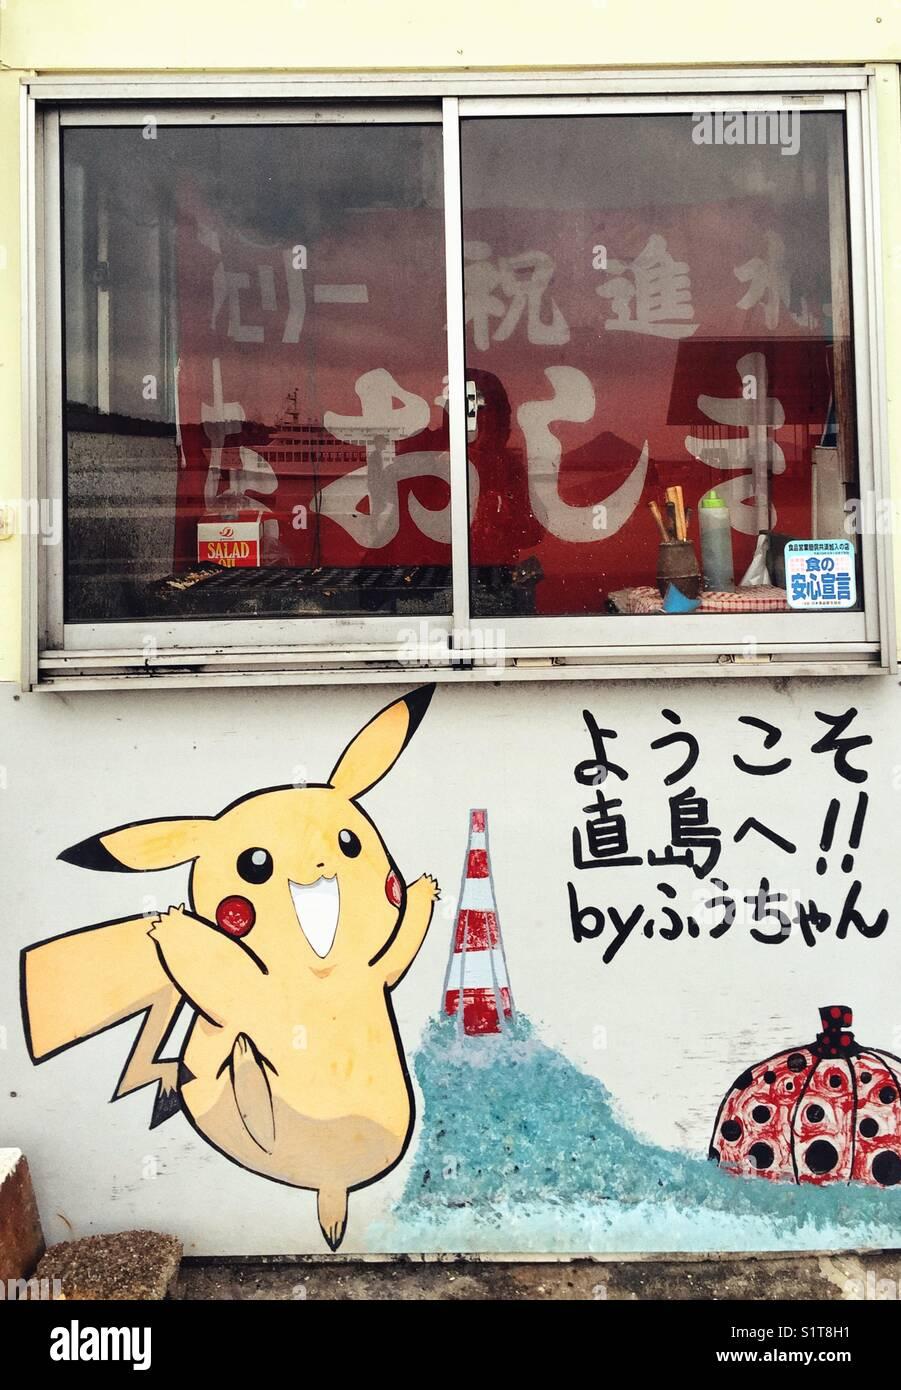 Fast food Fenster mit Pikachu Charakter und kusama's Kürbis an die Wand gemalt. Naoshima Island, Japan Stockbild